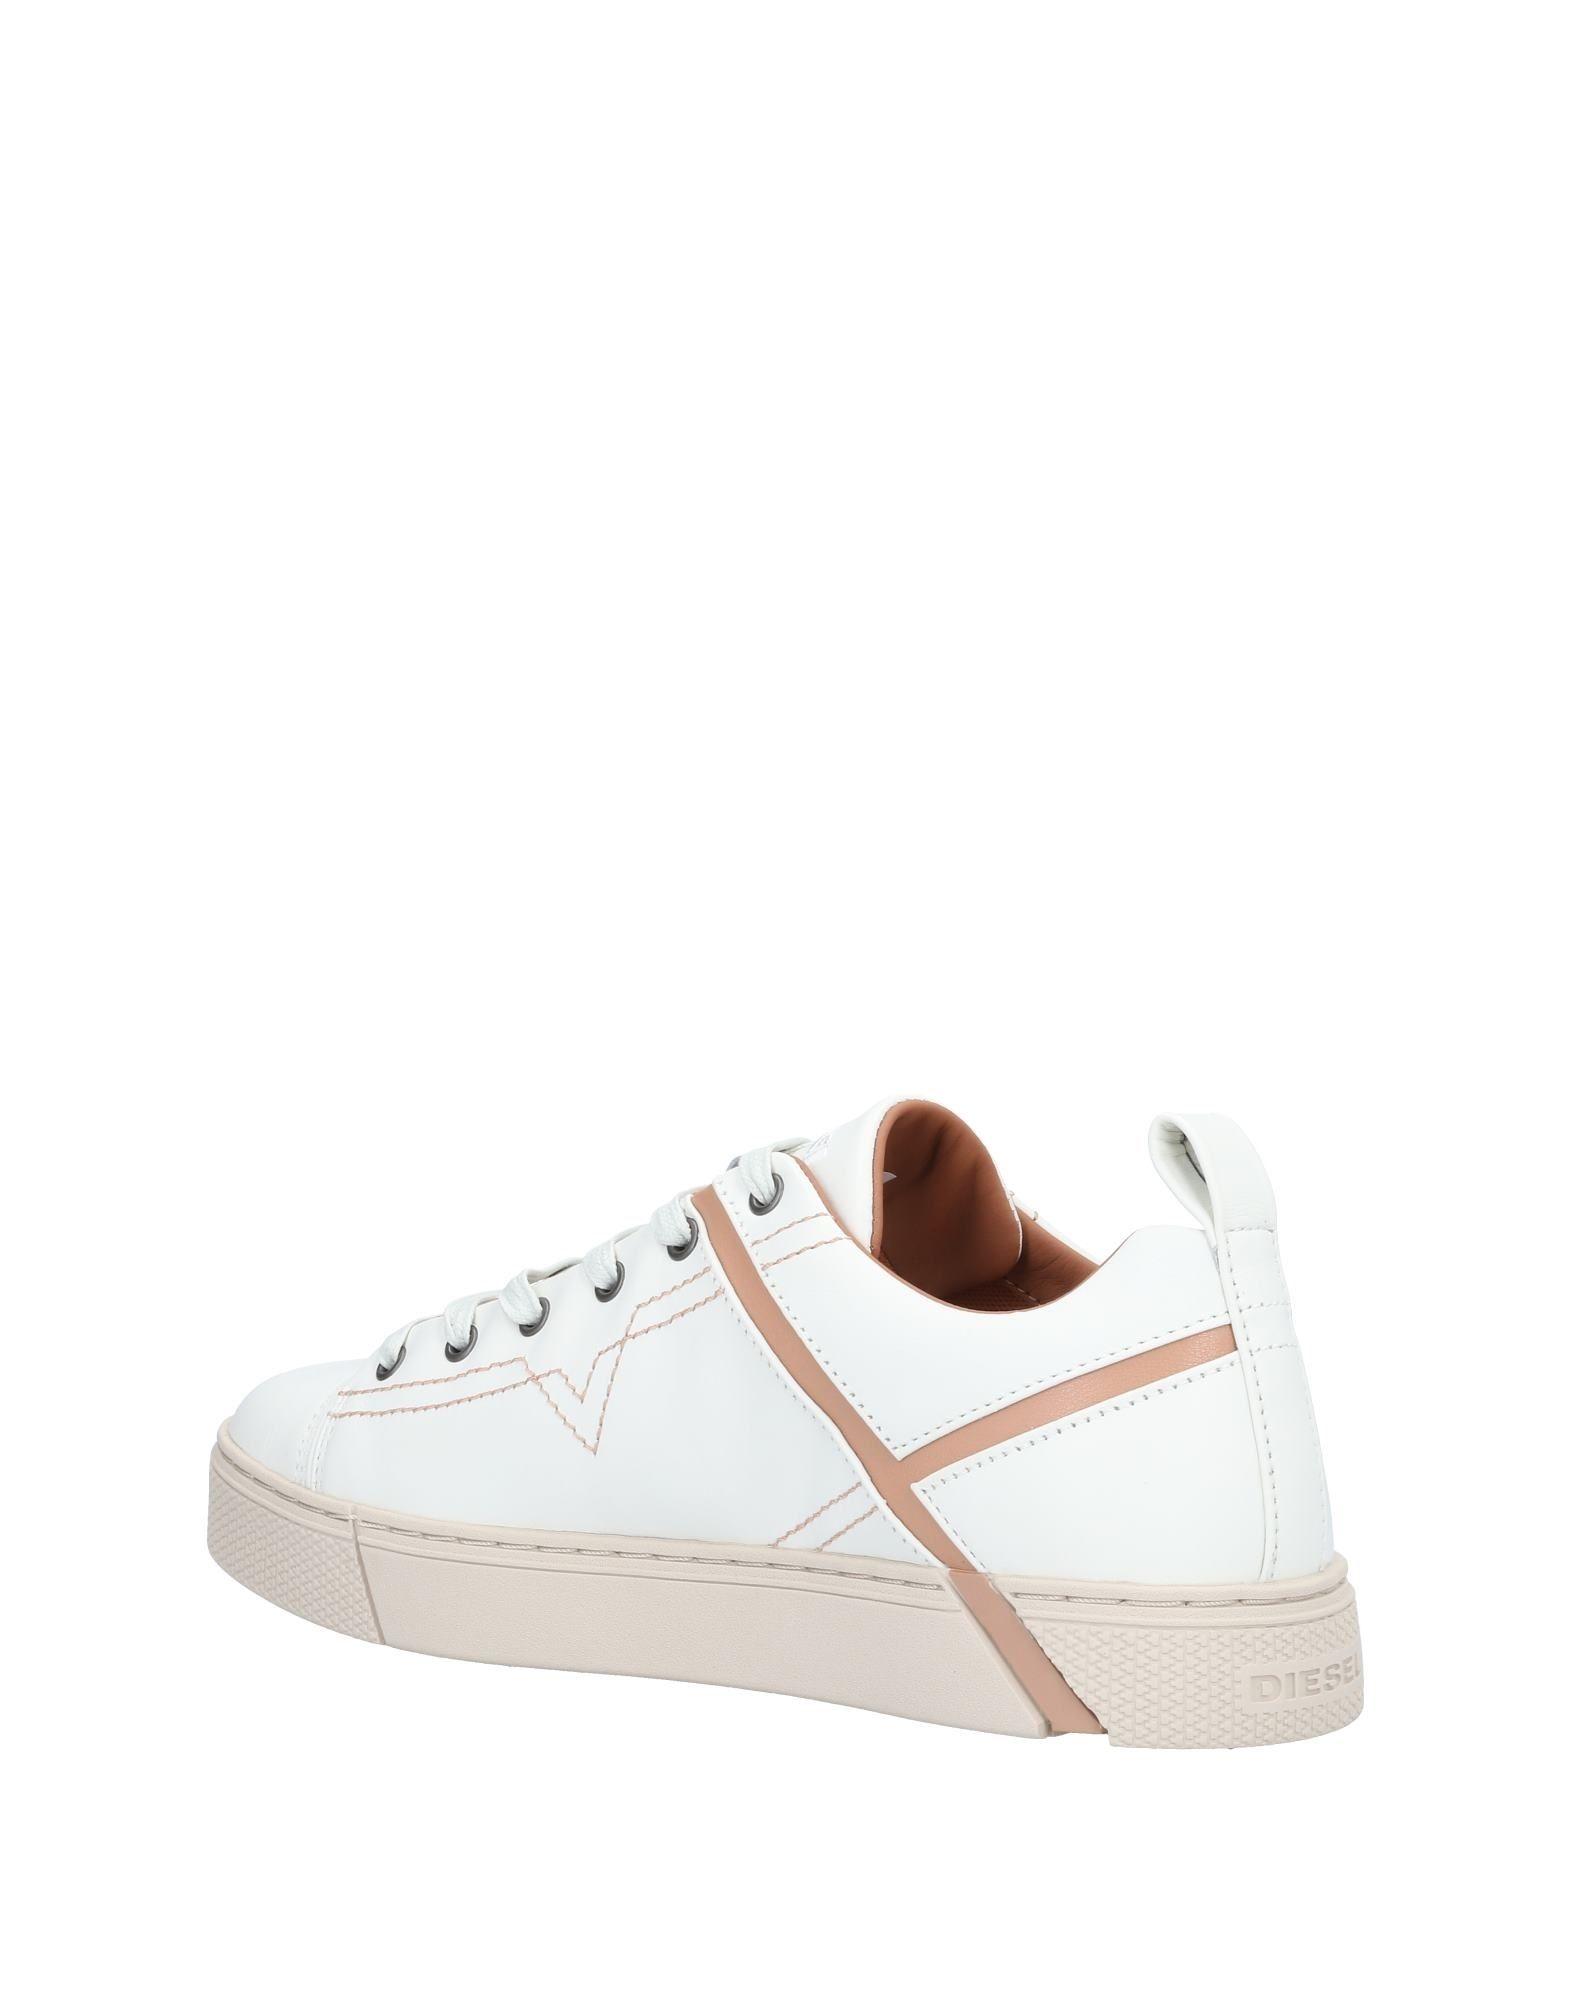 Diesel Sneakers Herren  11495982HG Schuhe Heiße Schuhe 11495982HG edbd36